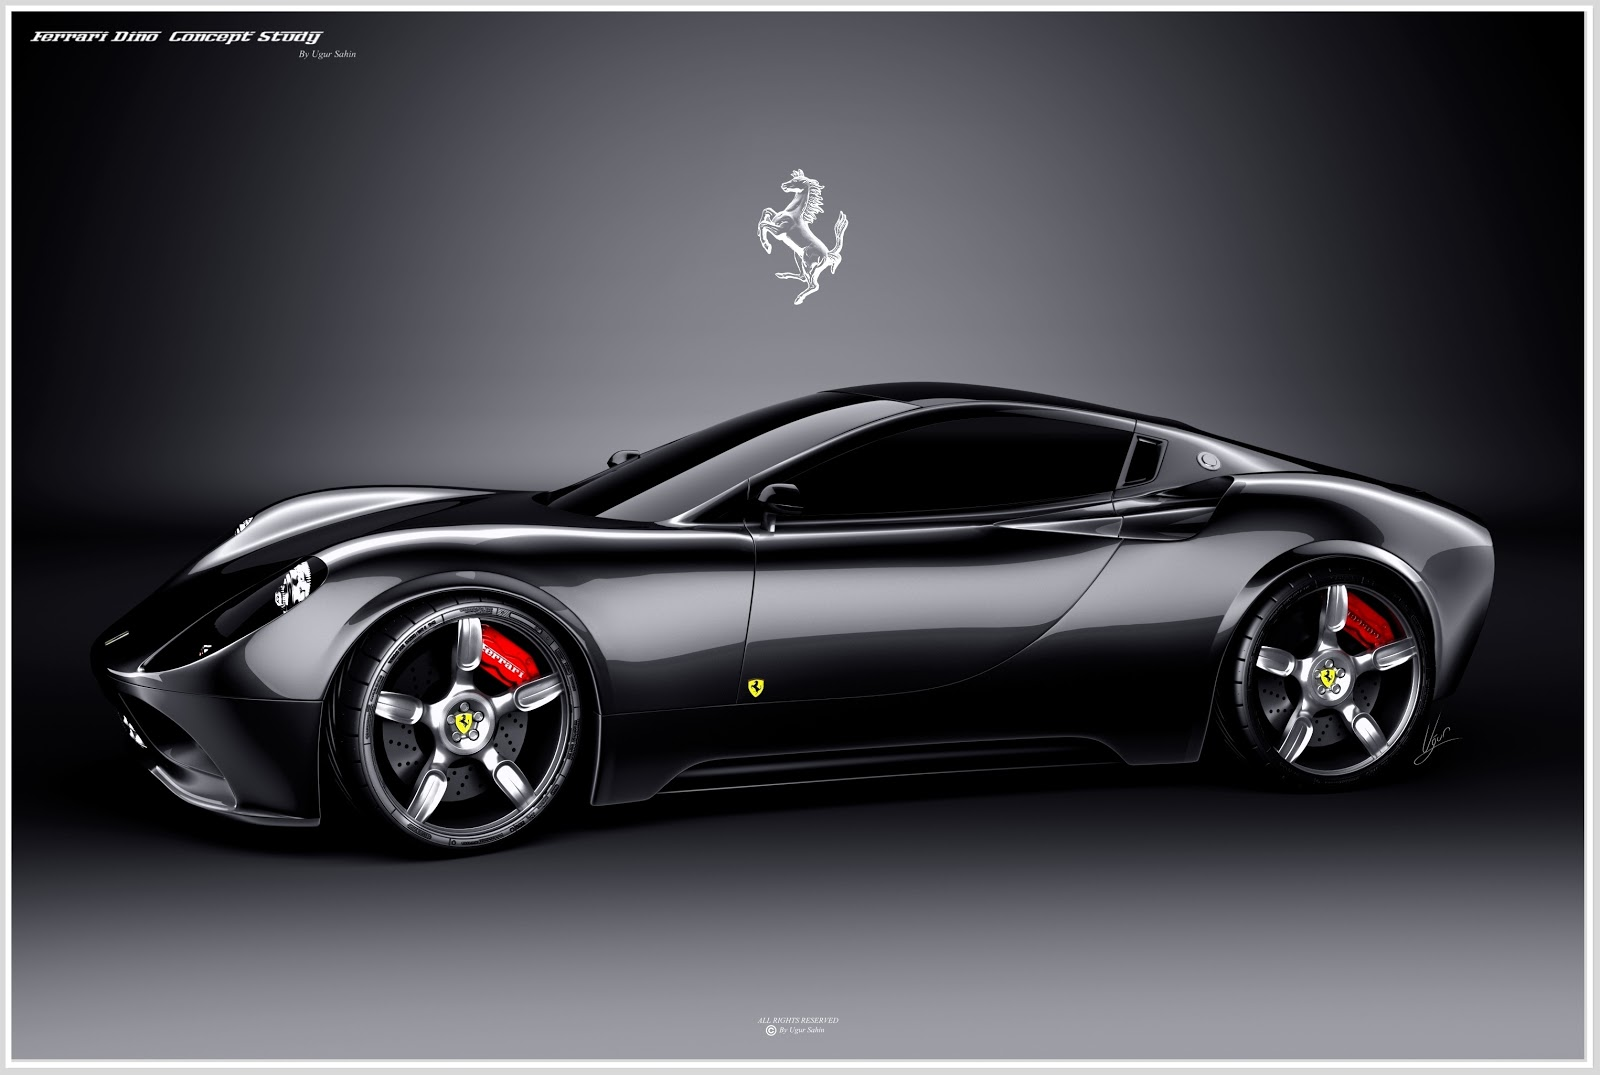 http://2.bp.blogspot.com/-WaEOri33v_Y/TgWkLYnCDpI/AAAAAAAADQ0/5qV0Xm0MdEk/s1600/cars++3050x2050+Wallpaper.jpg